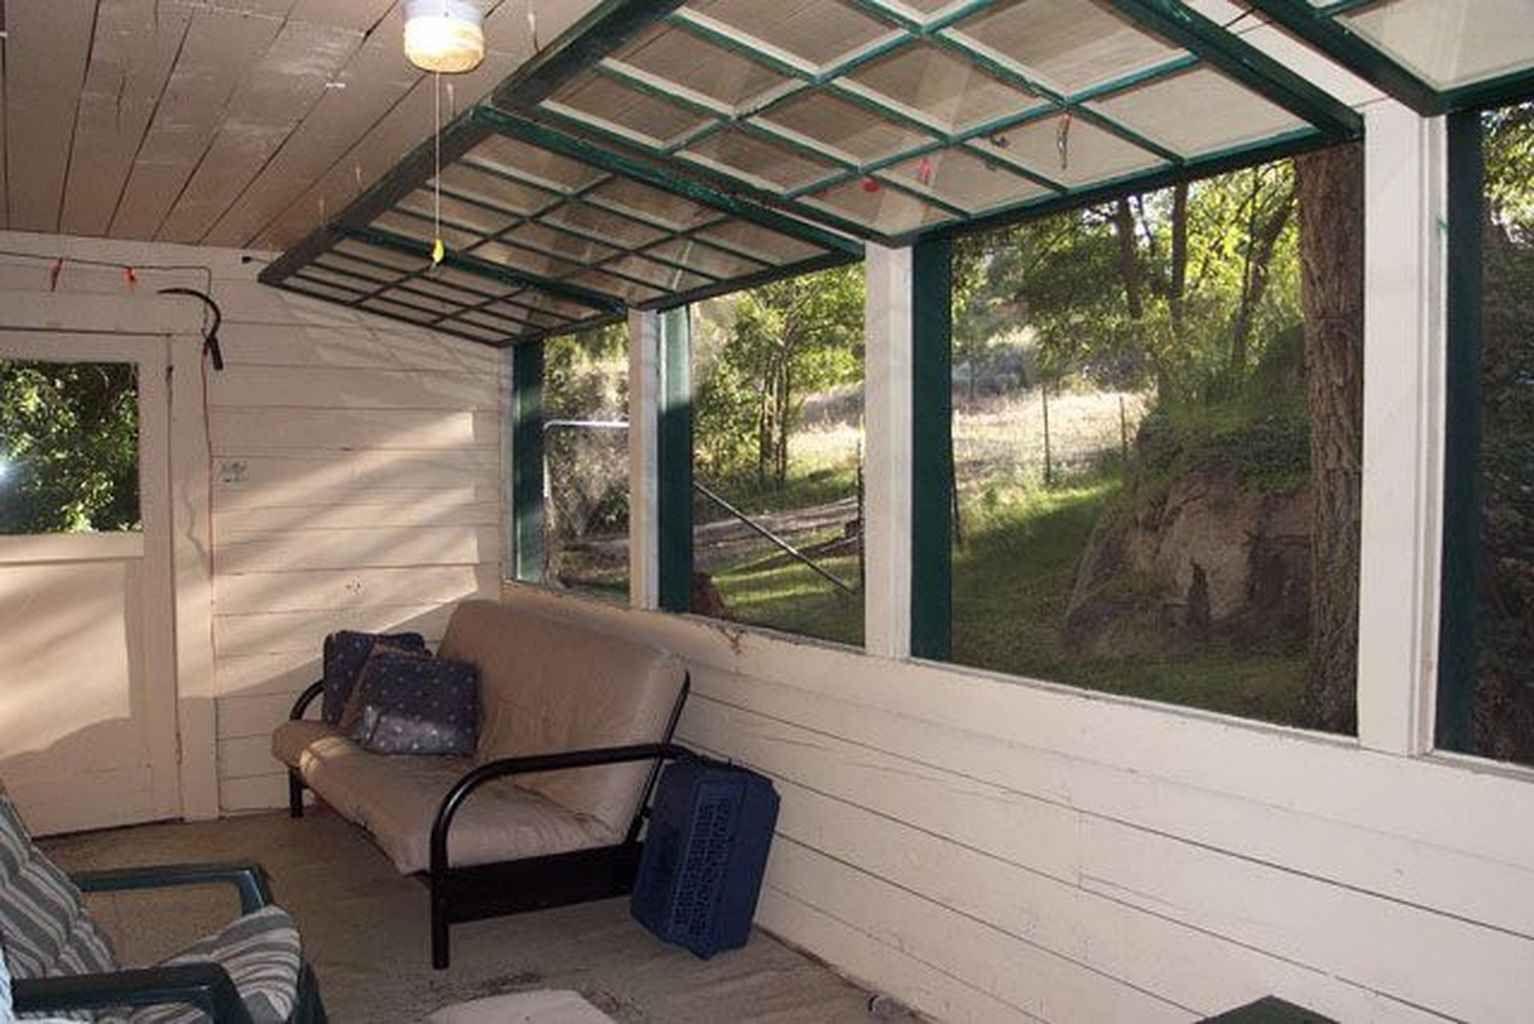 25 Cozy Farmhouse Screened In Porch Design Ideas Homixover Com Patio Windows Porch Design Screened Porch Designs